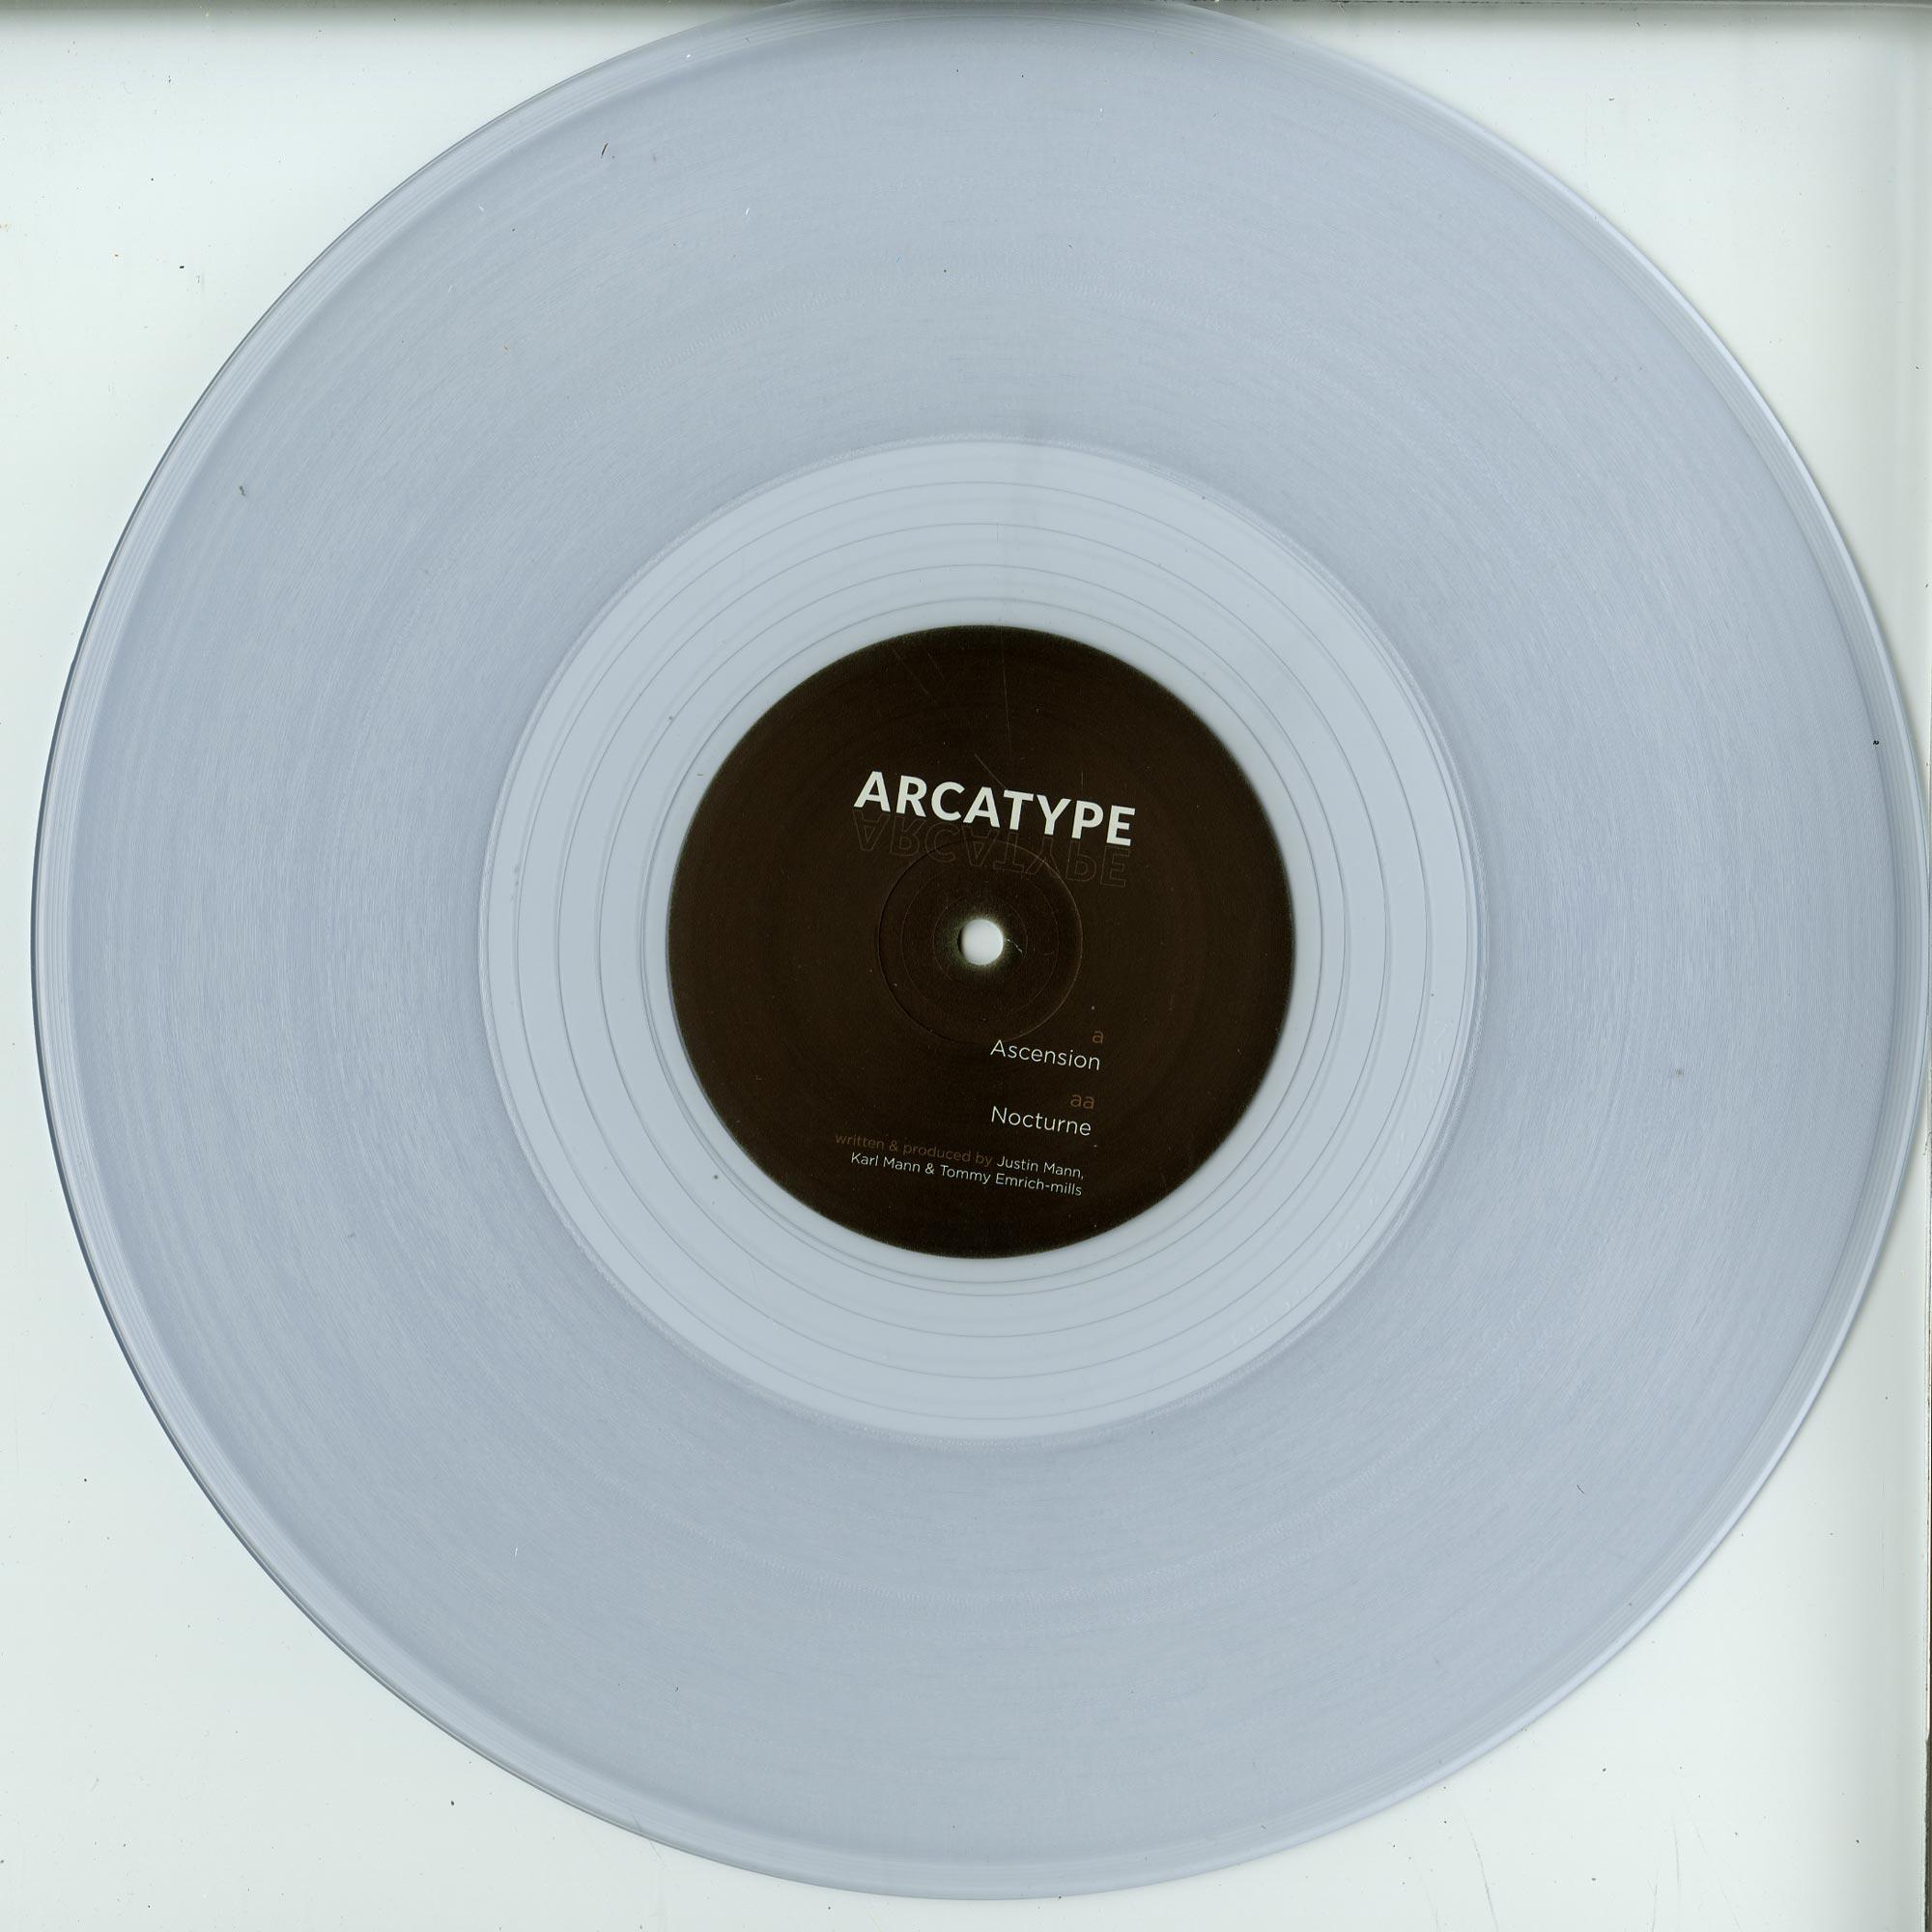 Arcatype - ASCENSION / NOCTURNE